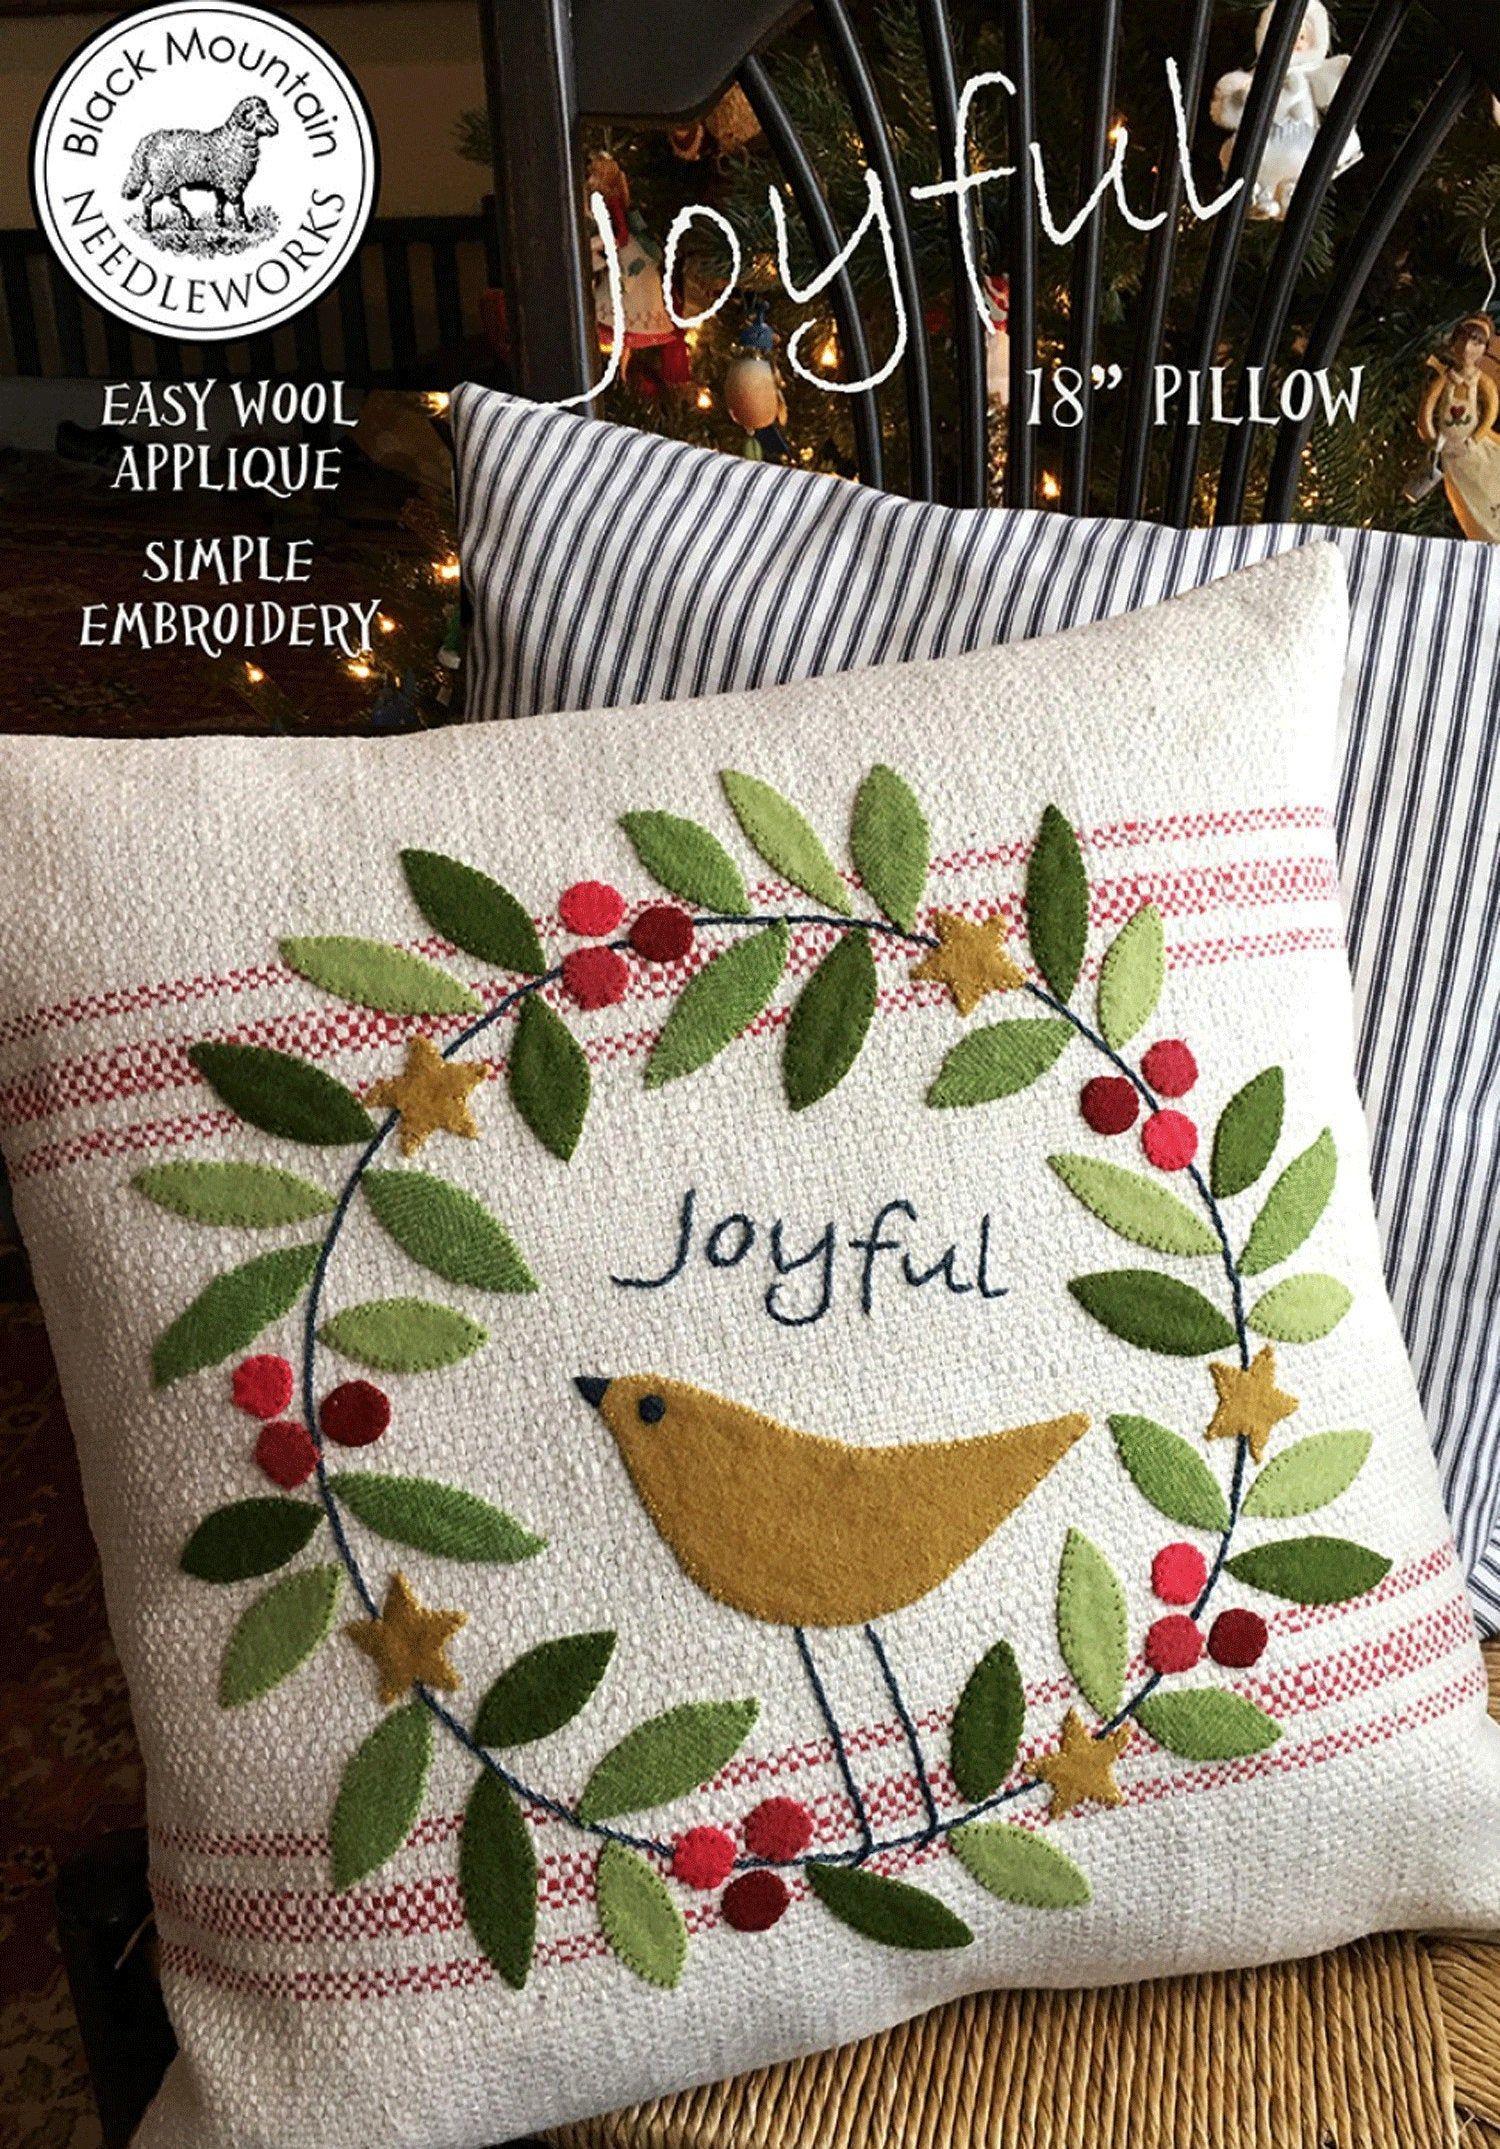 Joyful Pillow Pattern - Winter Season Pattern with Wool Applique - Christmas Pillow Pattern - BM 845